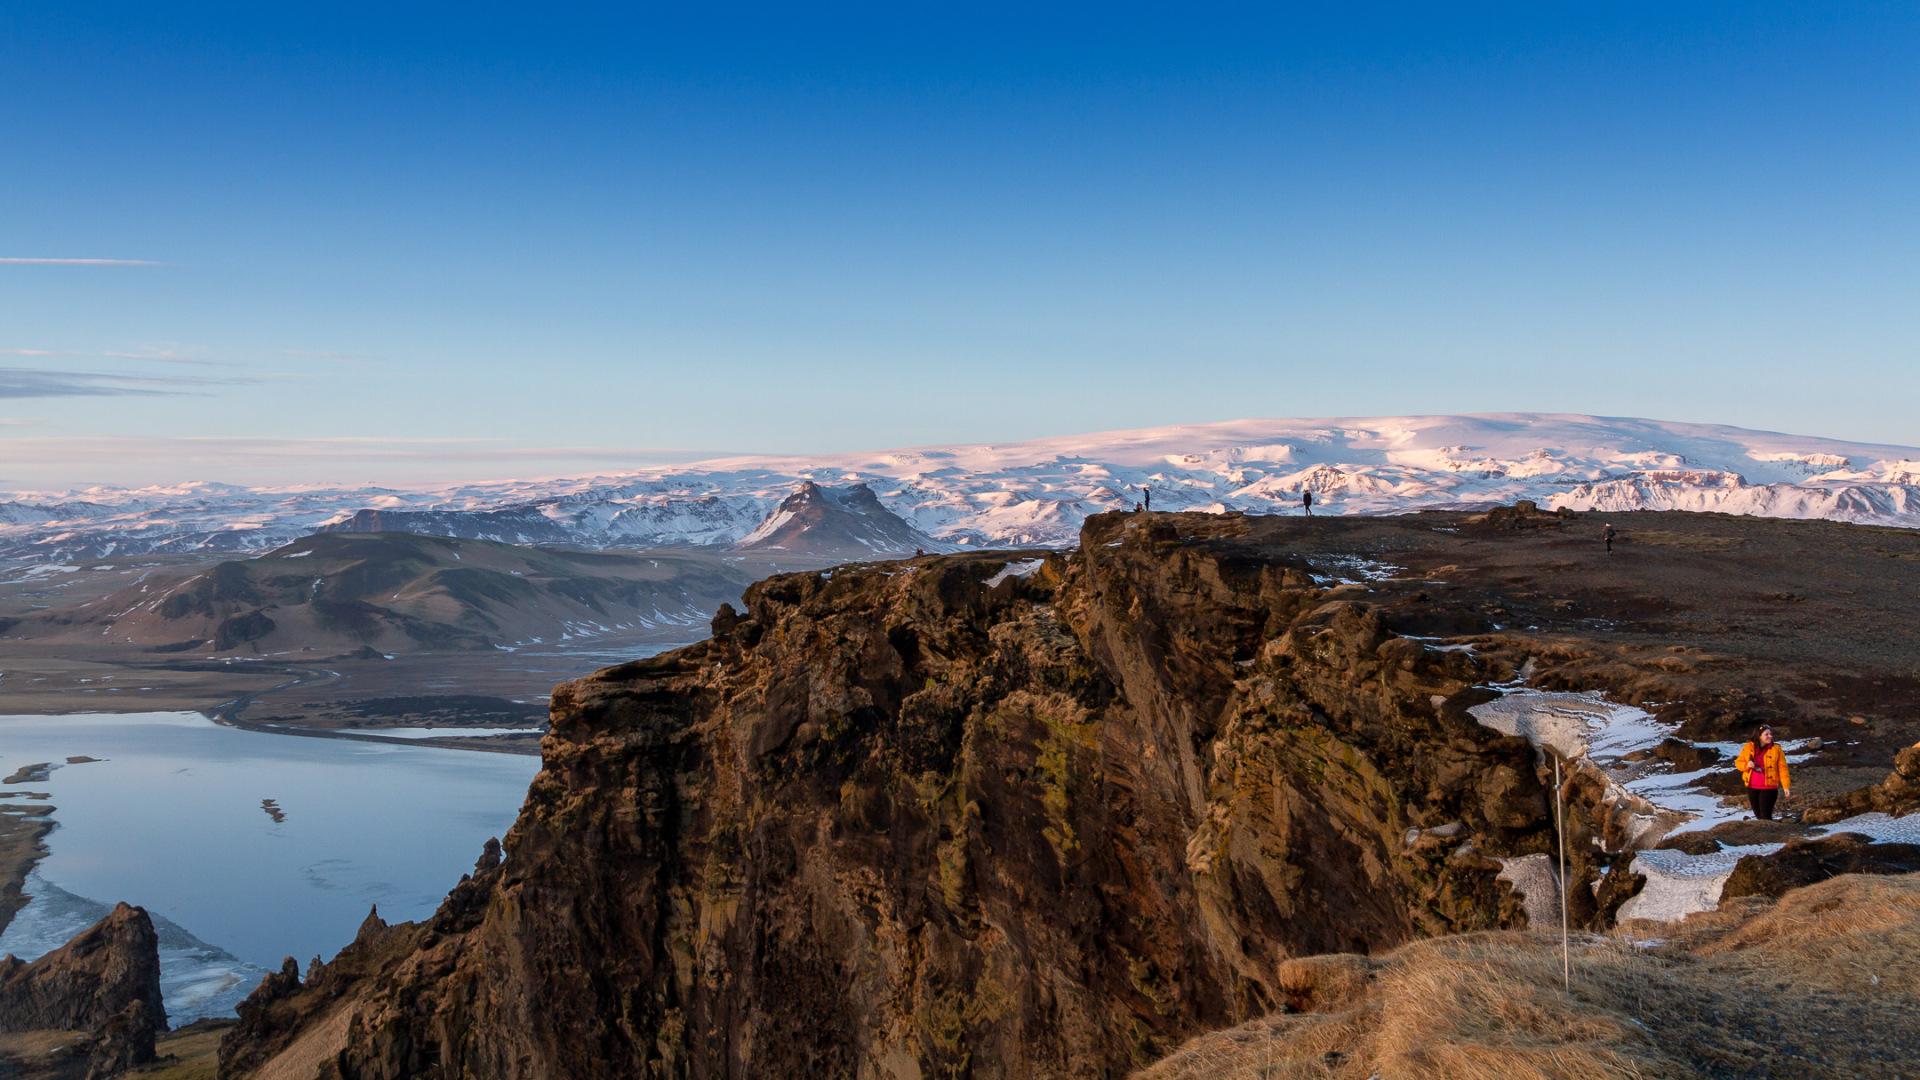 From Dyrholaey to Myrdalsjökull